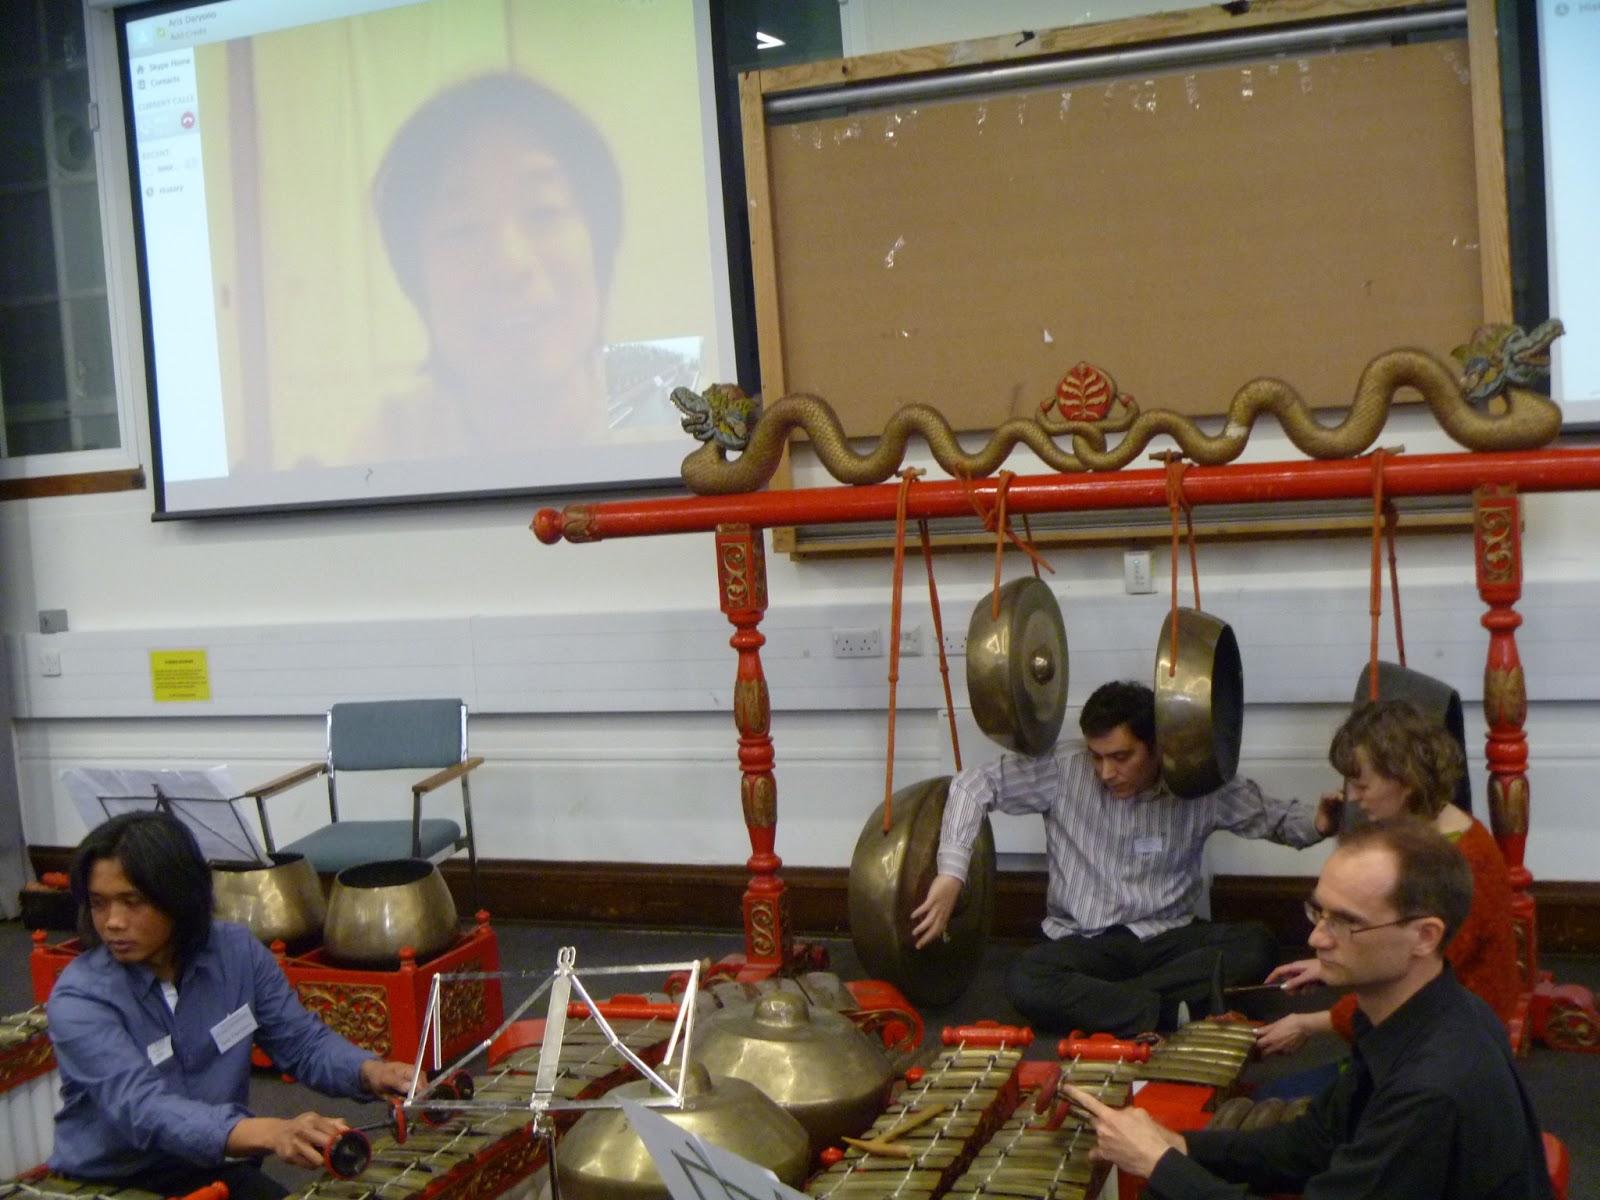 Indonesian performance Gamelan Composers' Forum